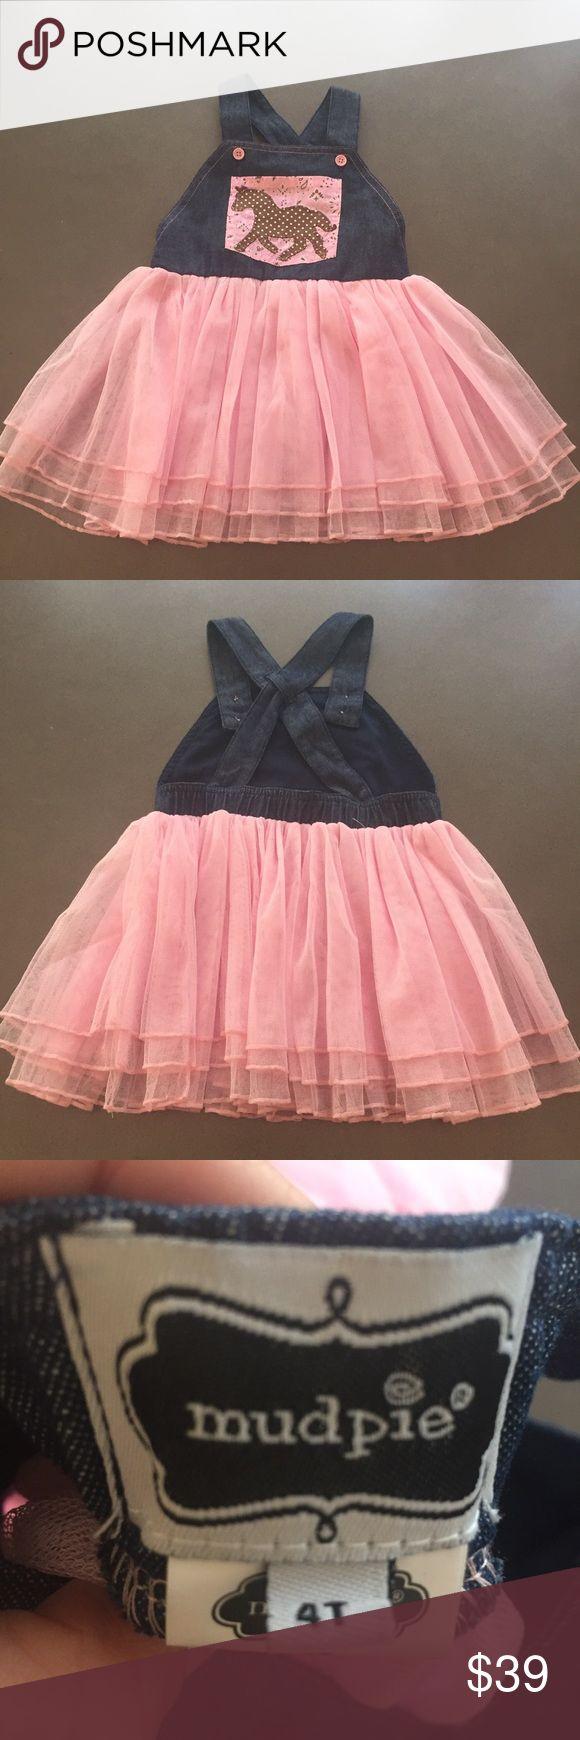 NWOT! Mud Pie tulle and denim dress Adorable NWOT pink tulle and denim cross back dress!  Perfect condition! Mud Pie Dresses Casual